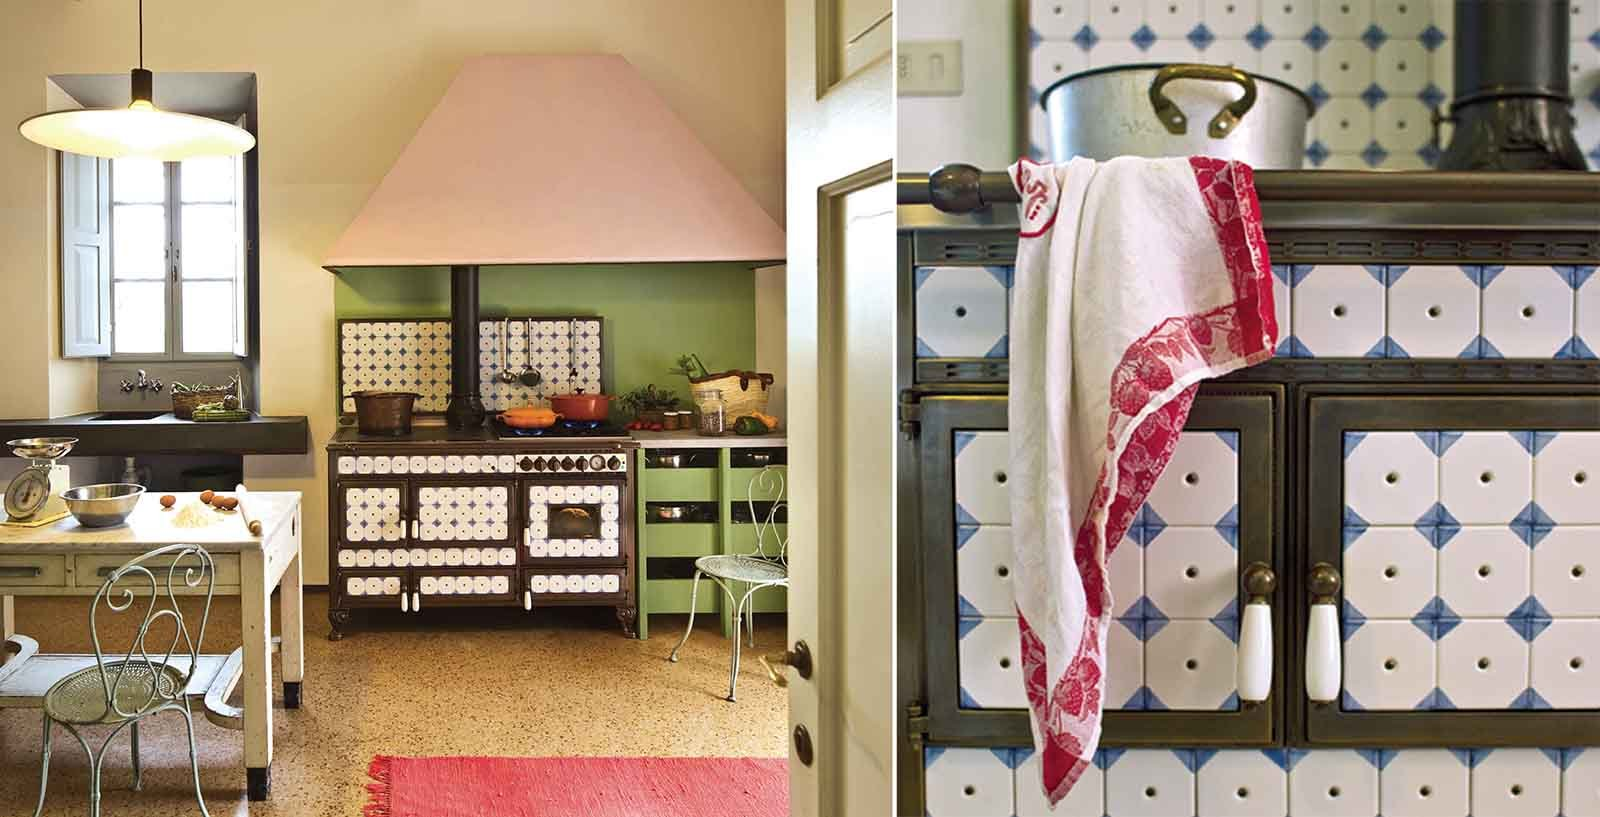 Cucine decorate per un ambiente originale e vivace cose for Piastrelle cucina decorate